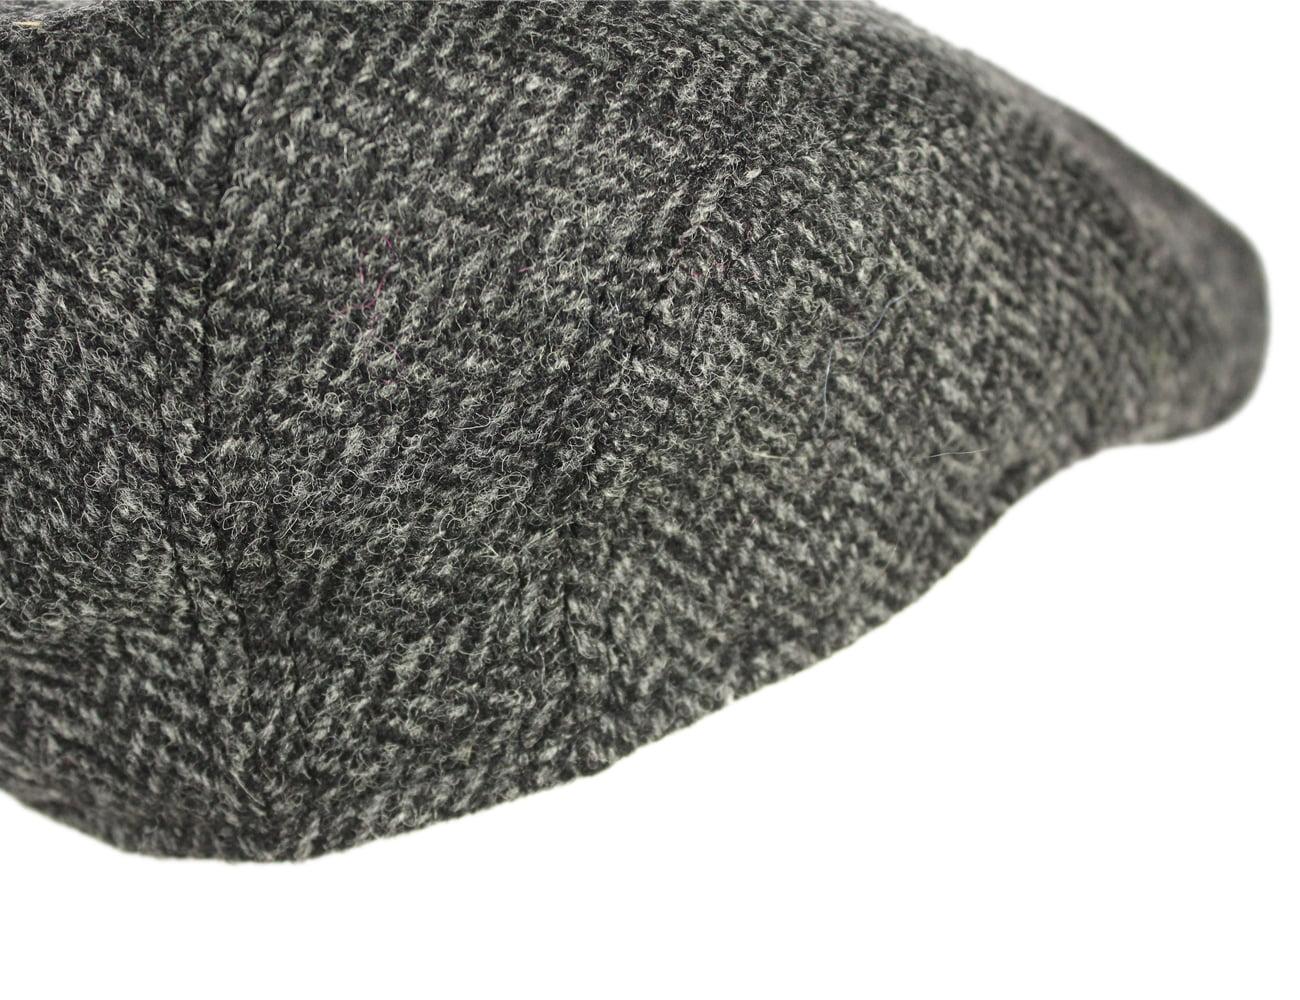 7705cb17cbaff duckbill scally cap irish tweed structured made in ireland - Walmart.com